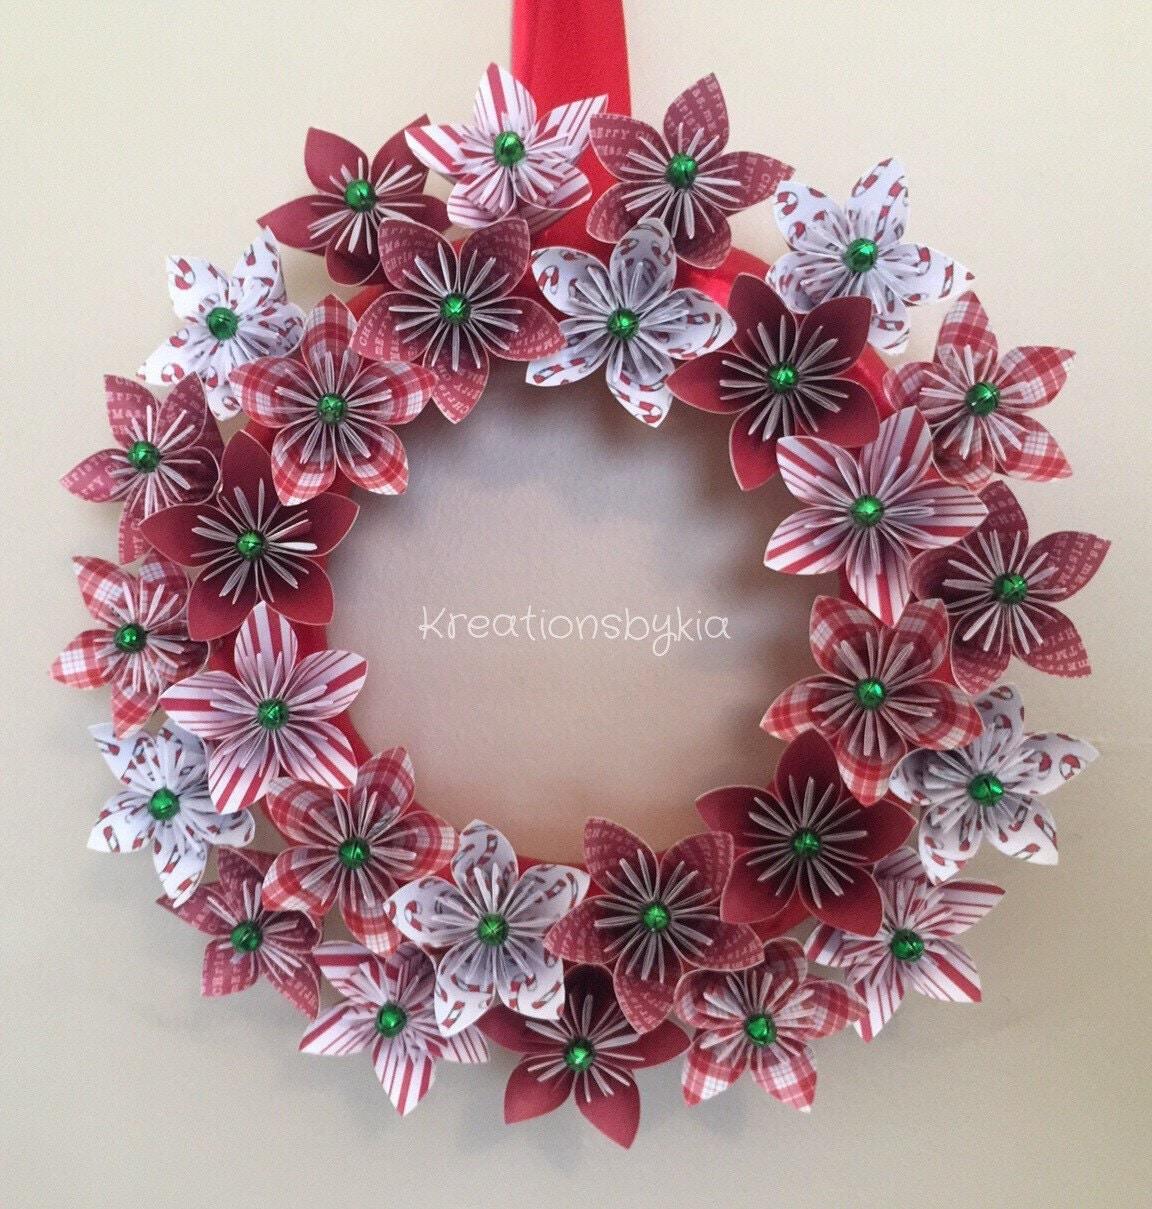 Origami Paper Flower Wreath / Christmas Wreath Paper Flower